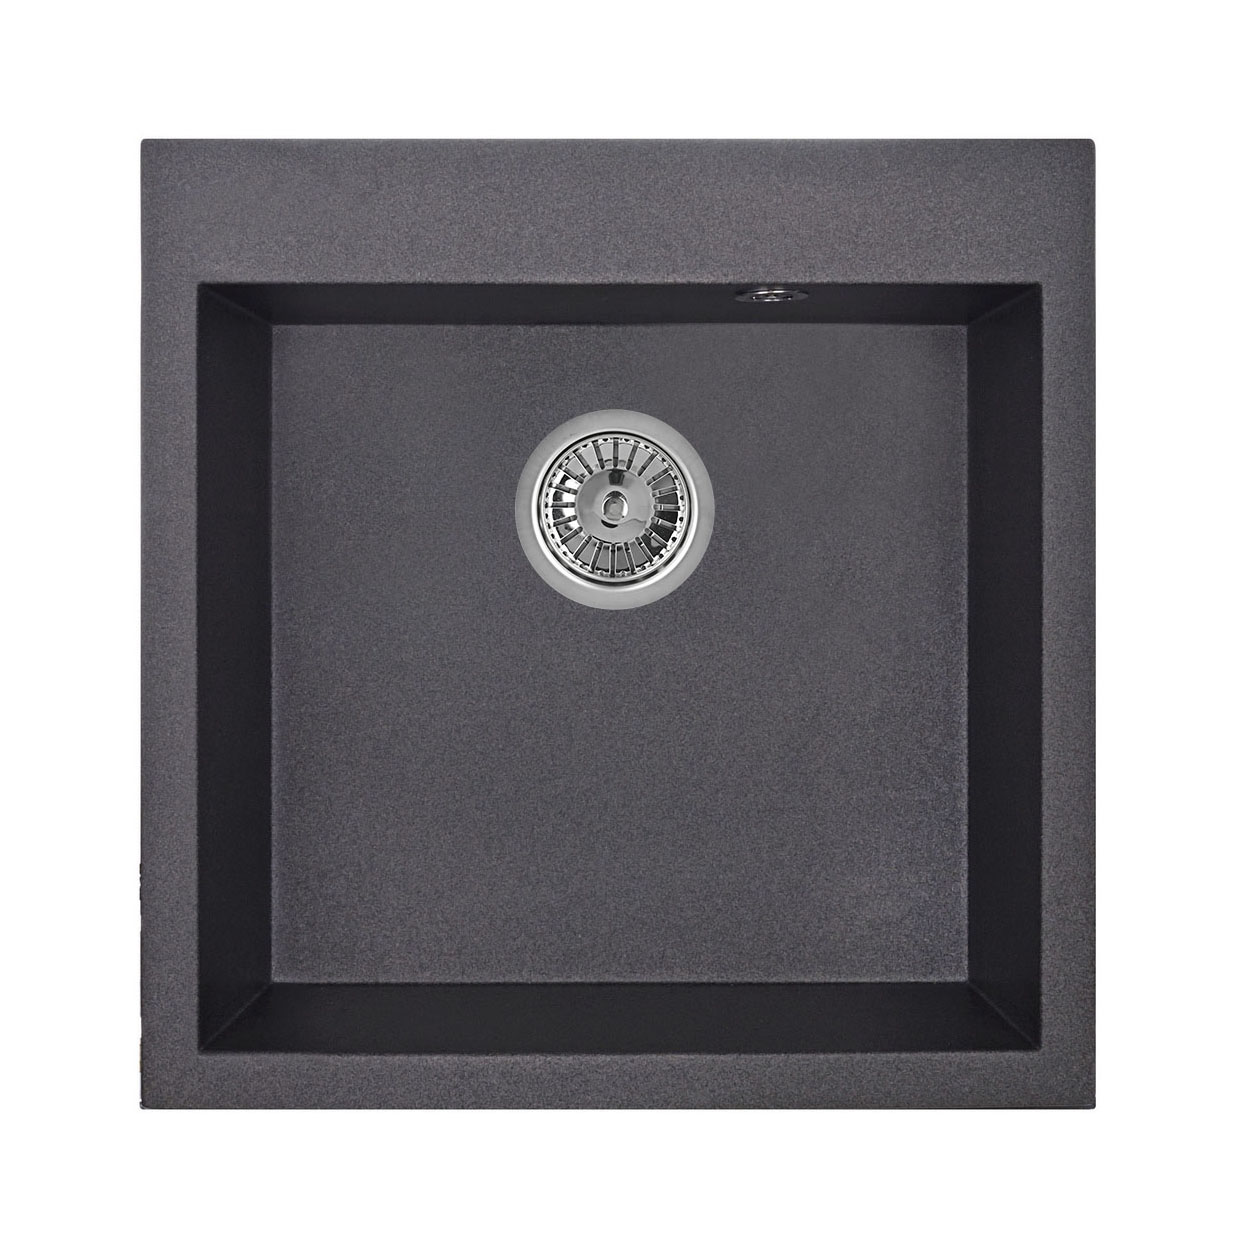 Кухонная мойка Granula GR-5102 505х510 черный посуда кухонная